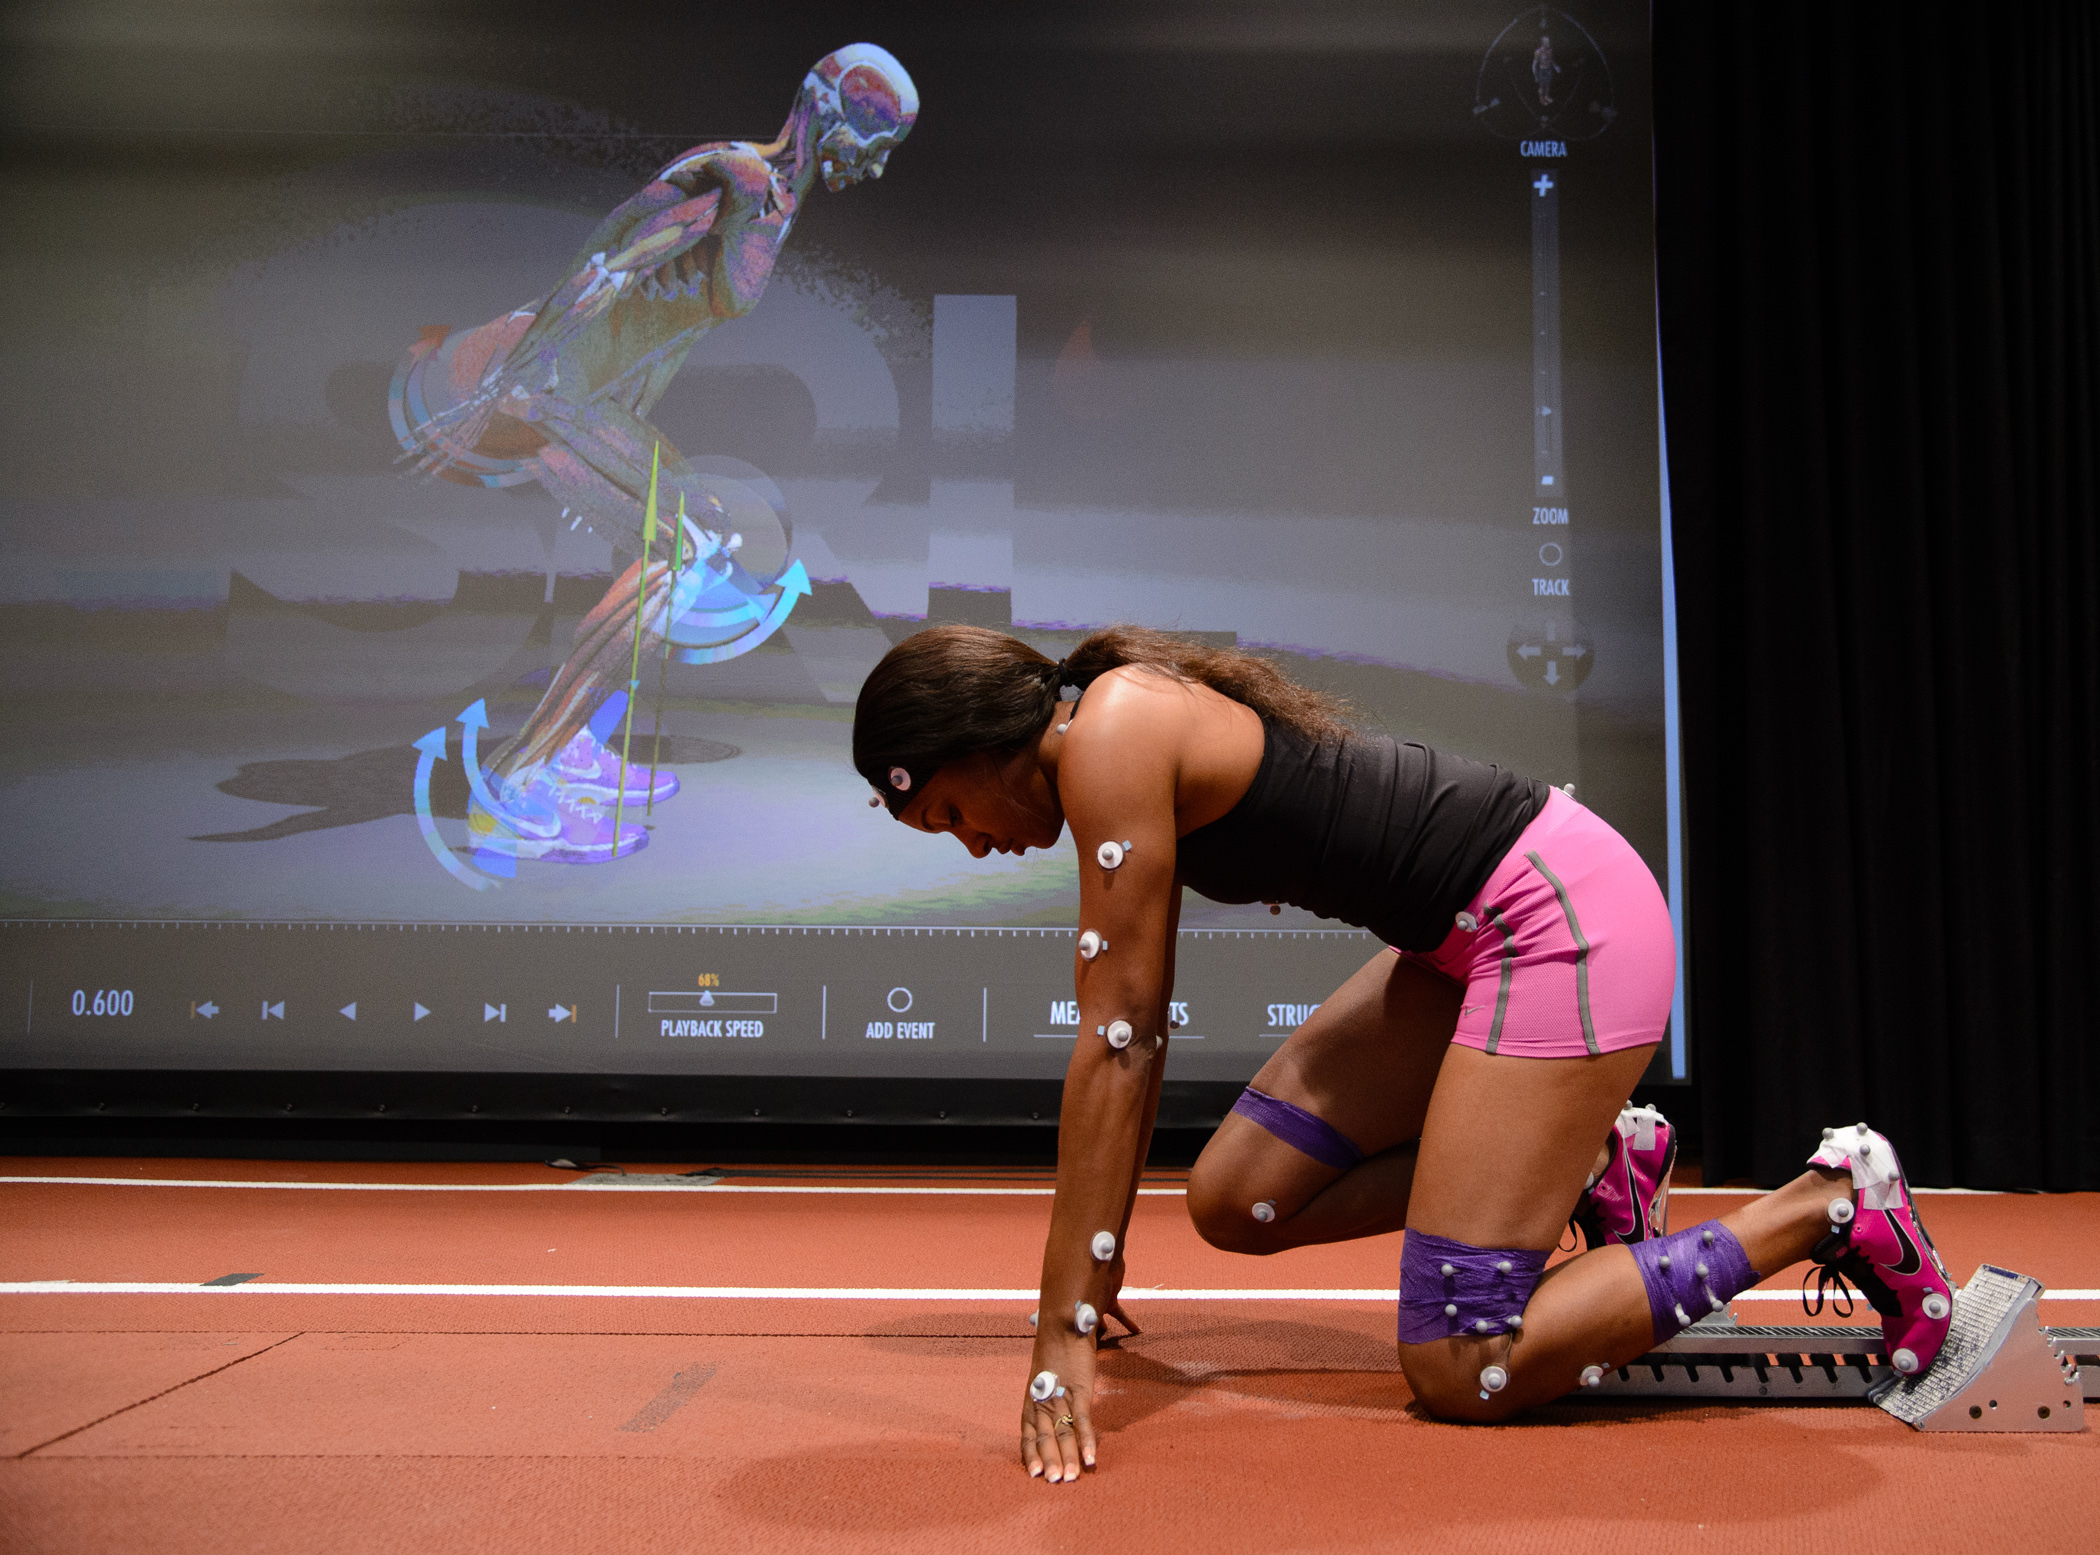 Nike-Sports-Research-Lab-13_original